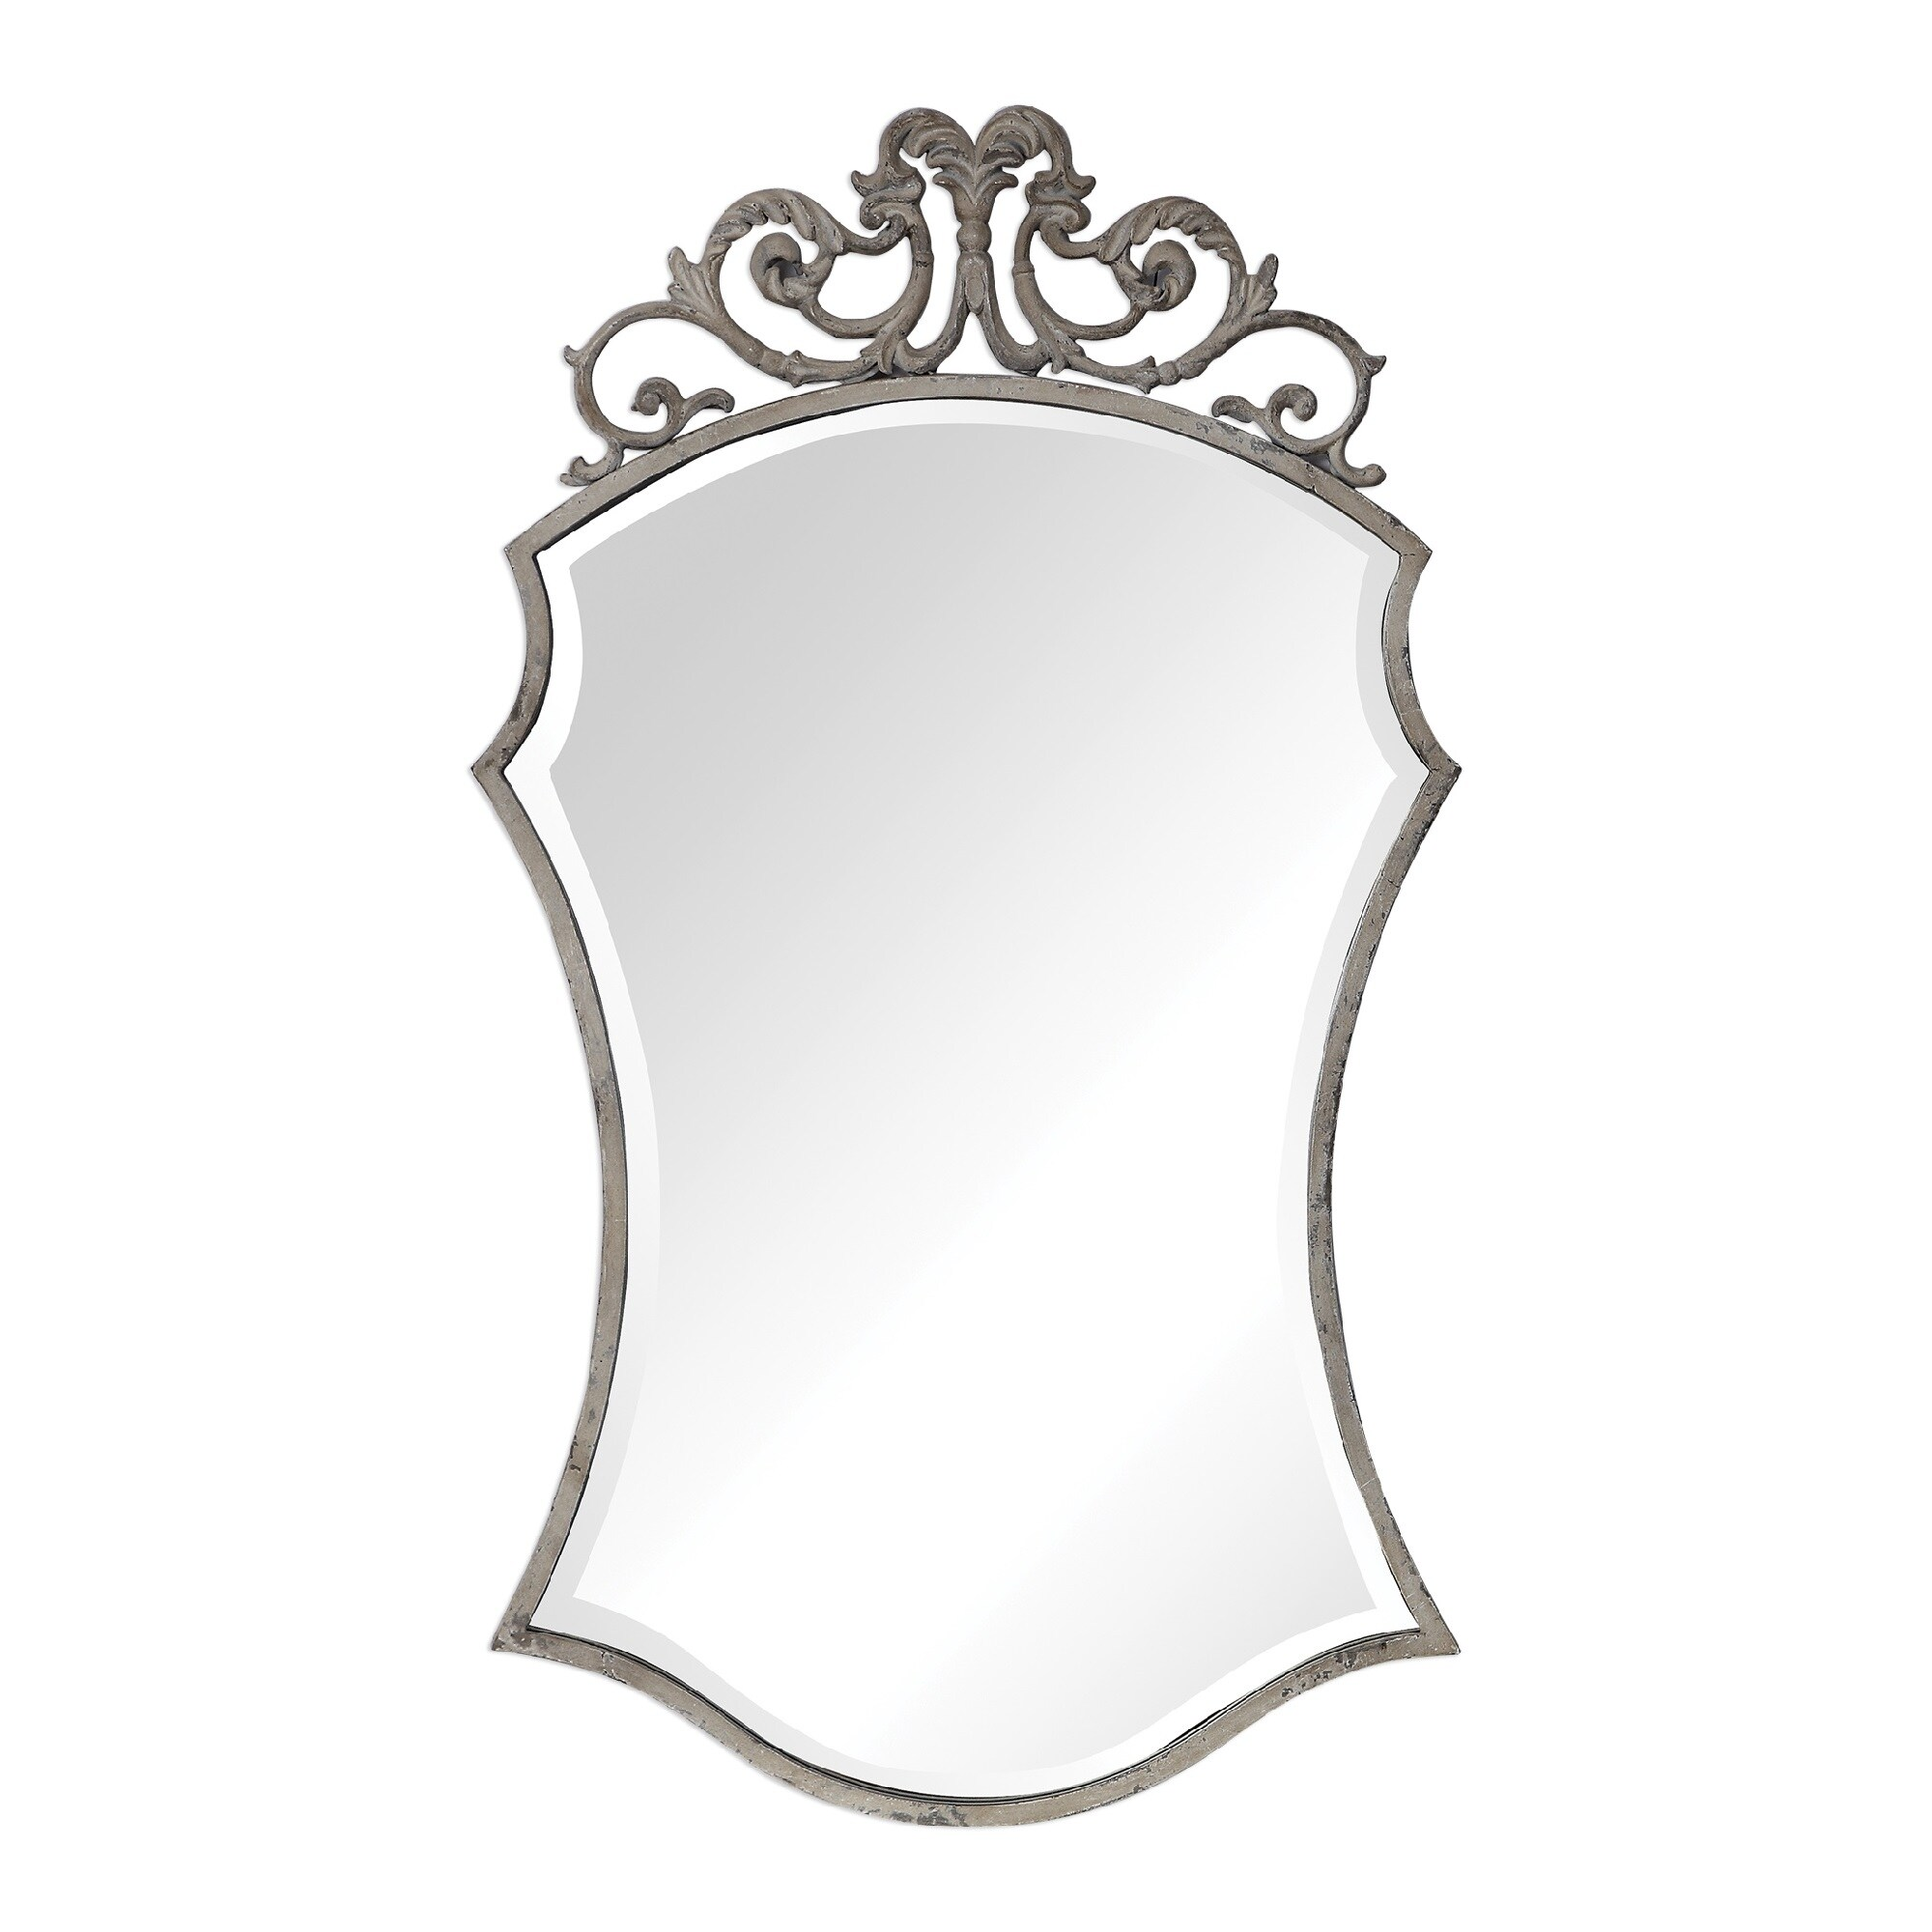 White Ornate Hanging Wall Mirror